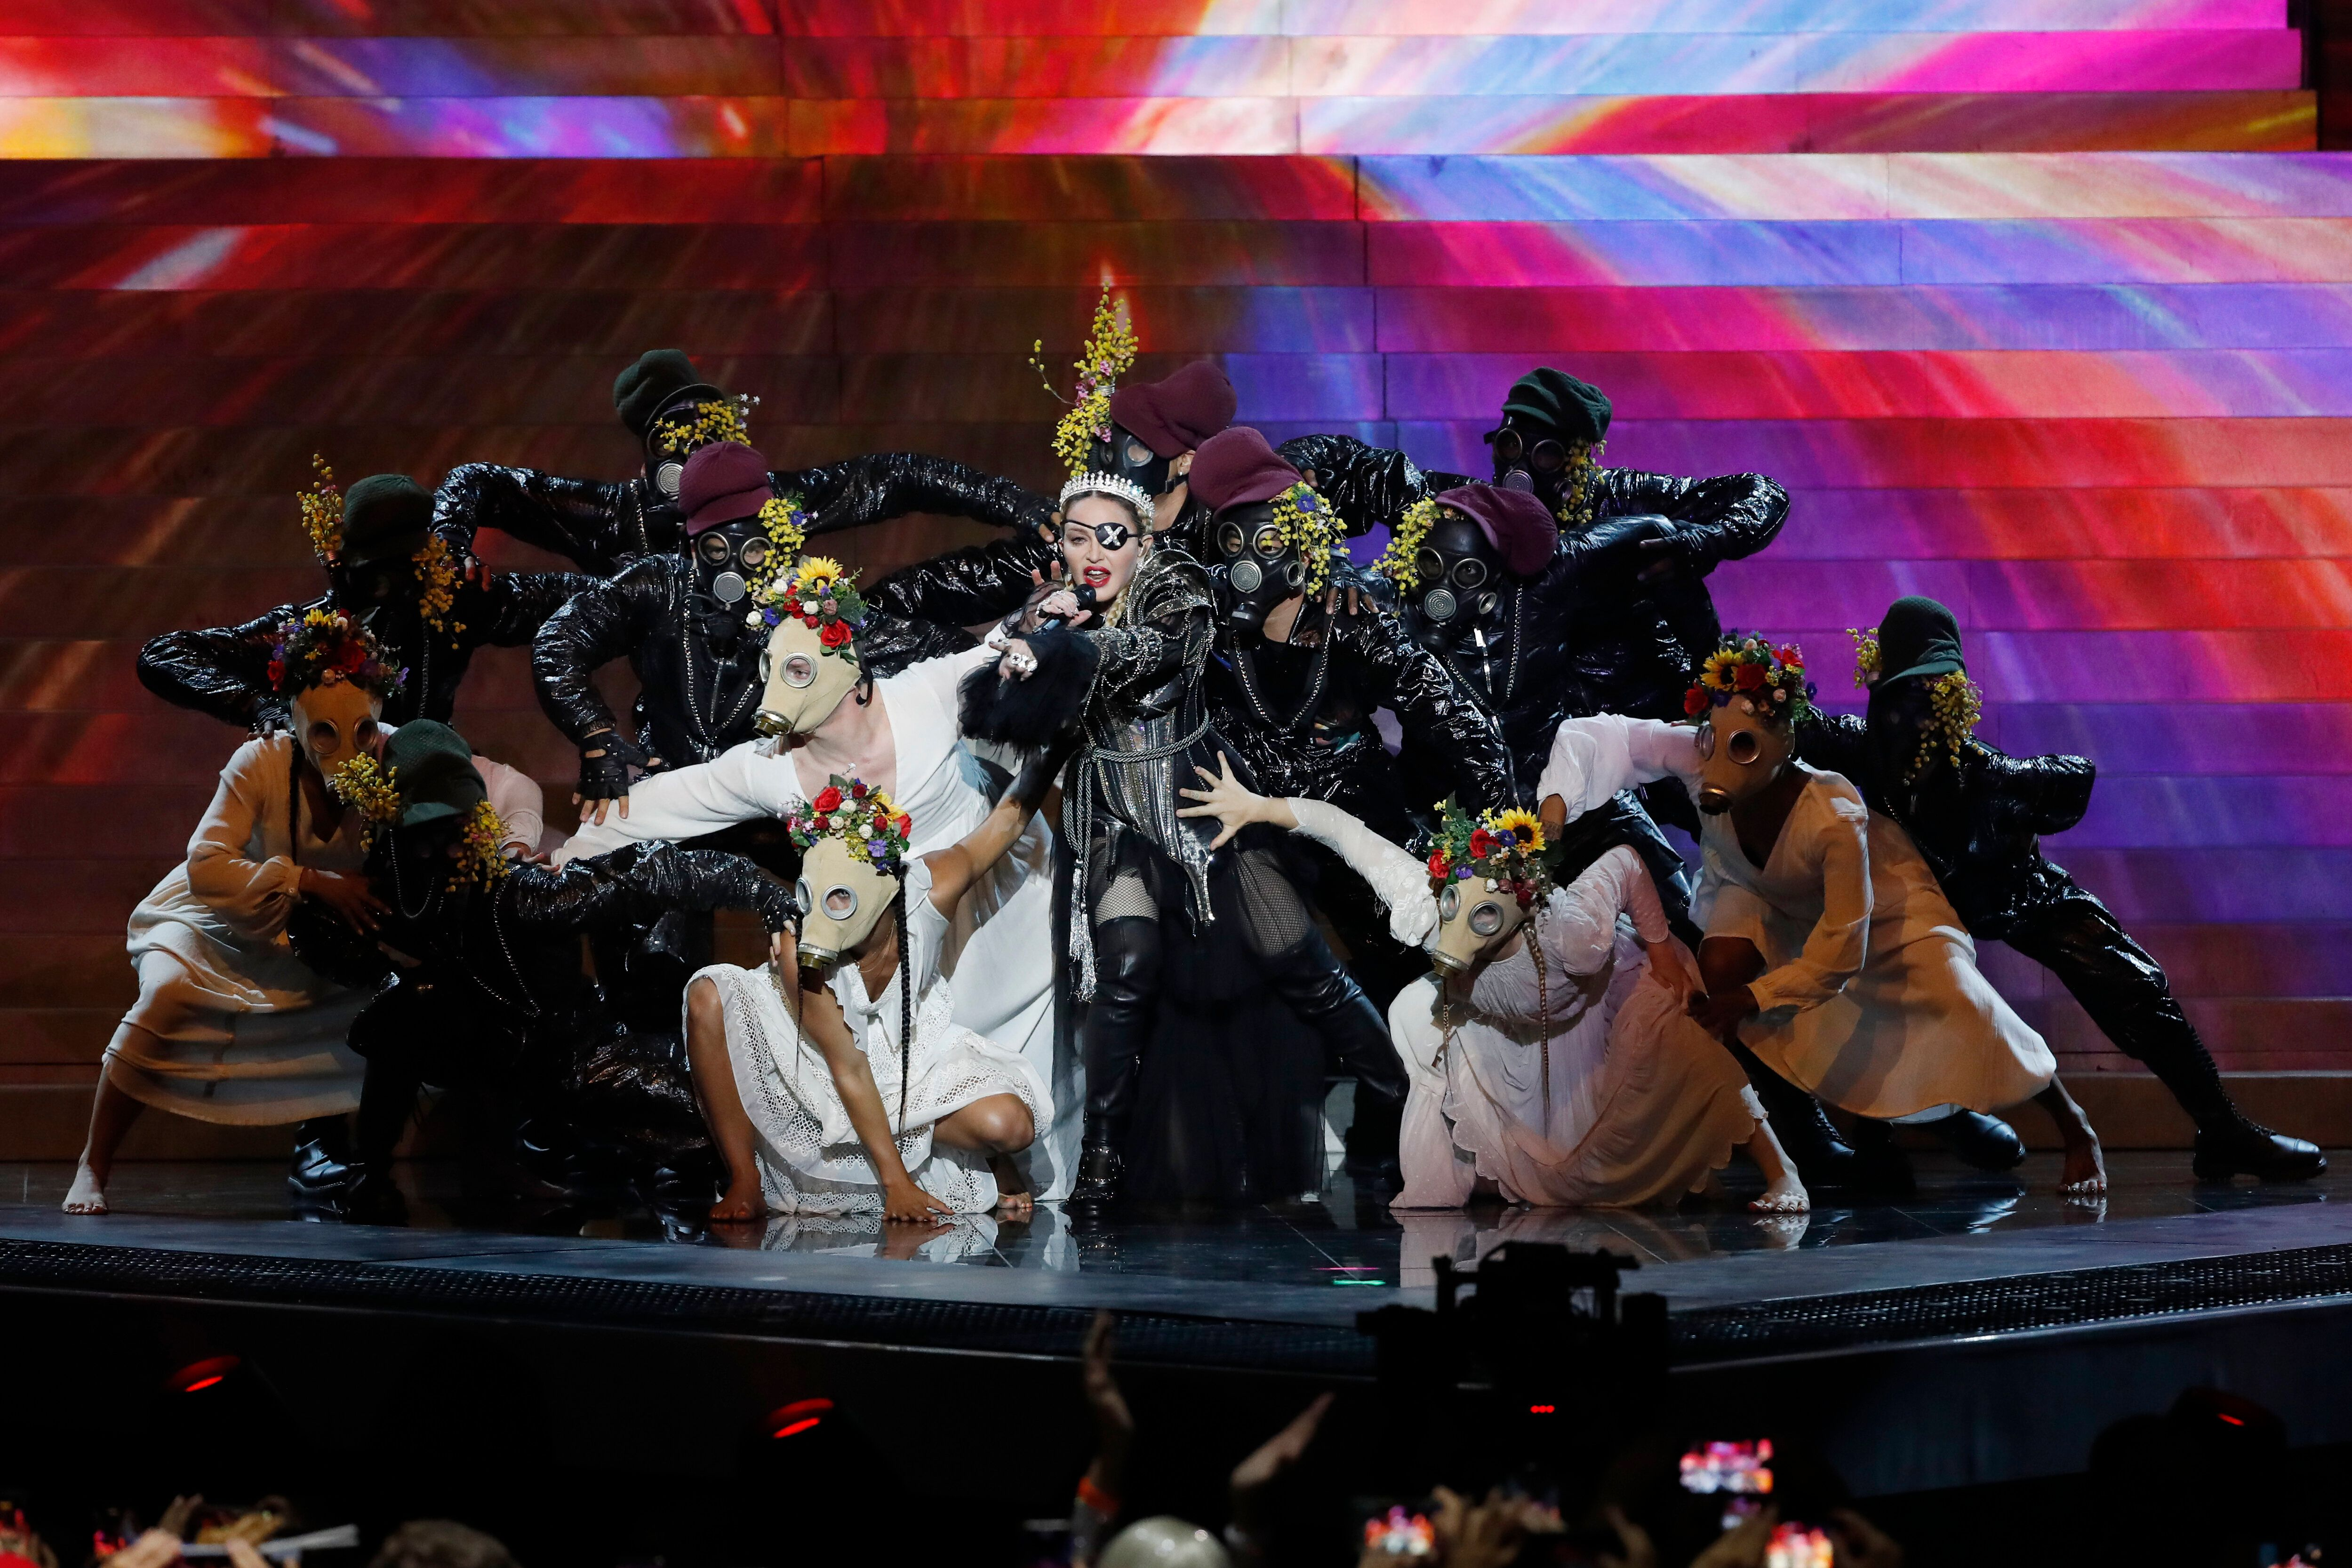 Los siete mejores momentos de Eurovisión